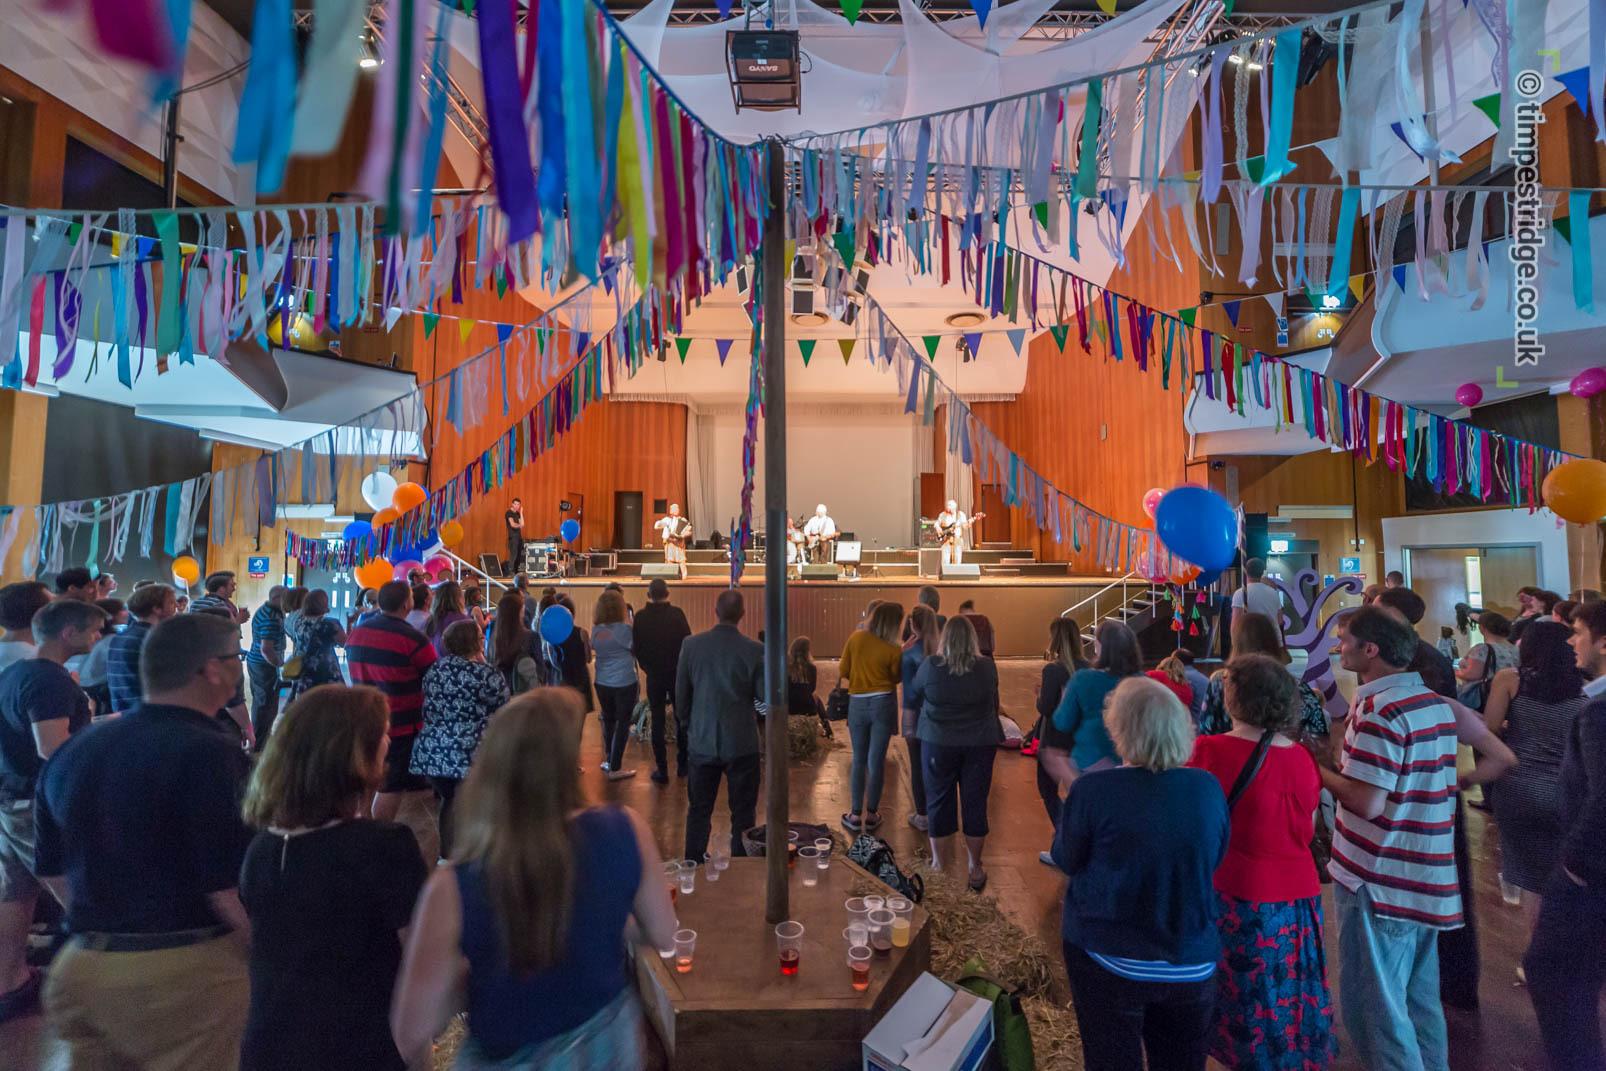 Tim Pestridge Commercial PhotographyUniversity of Exeter Staff Festival 2016 photos